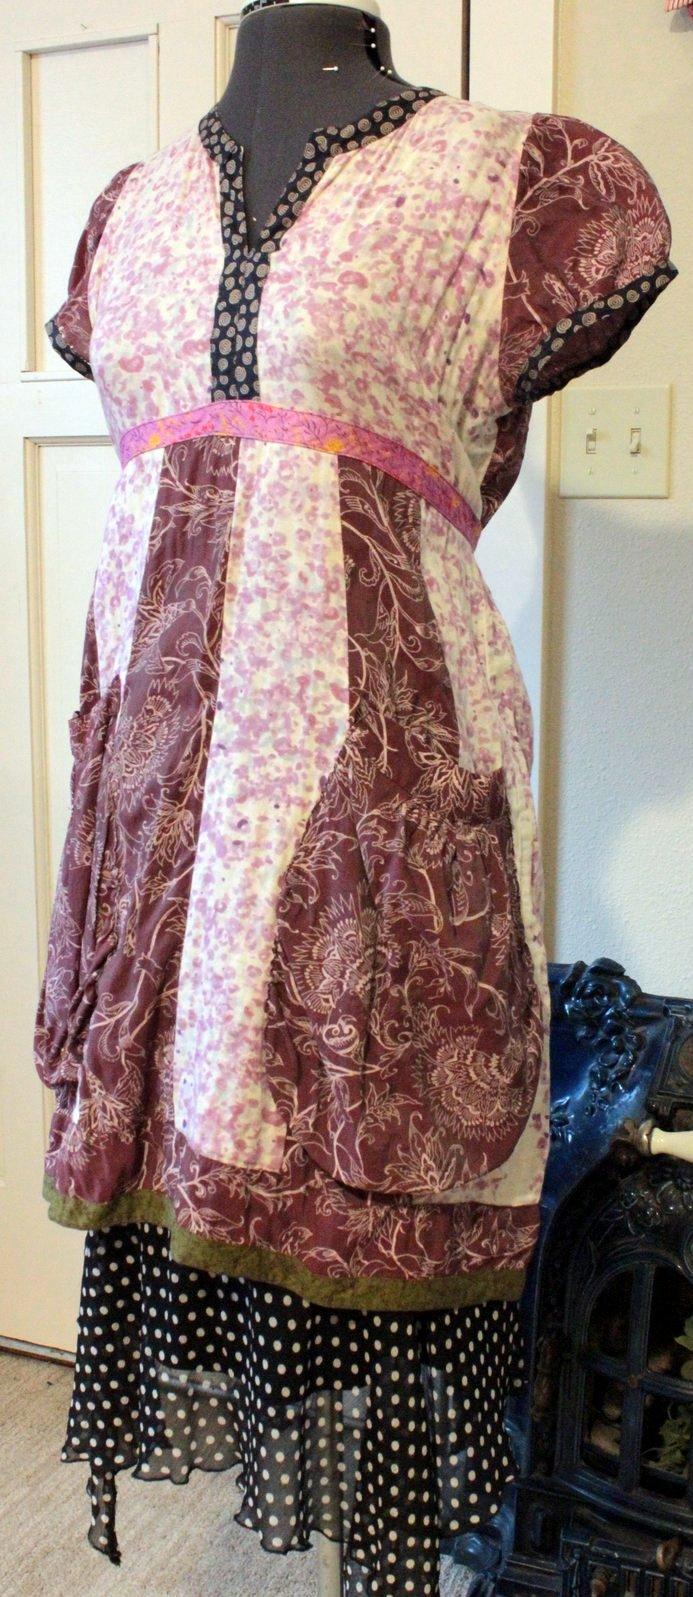 Rebe dress with Goodwill polka dot skirt